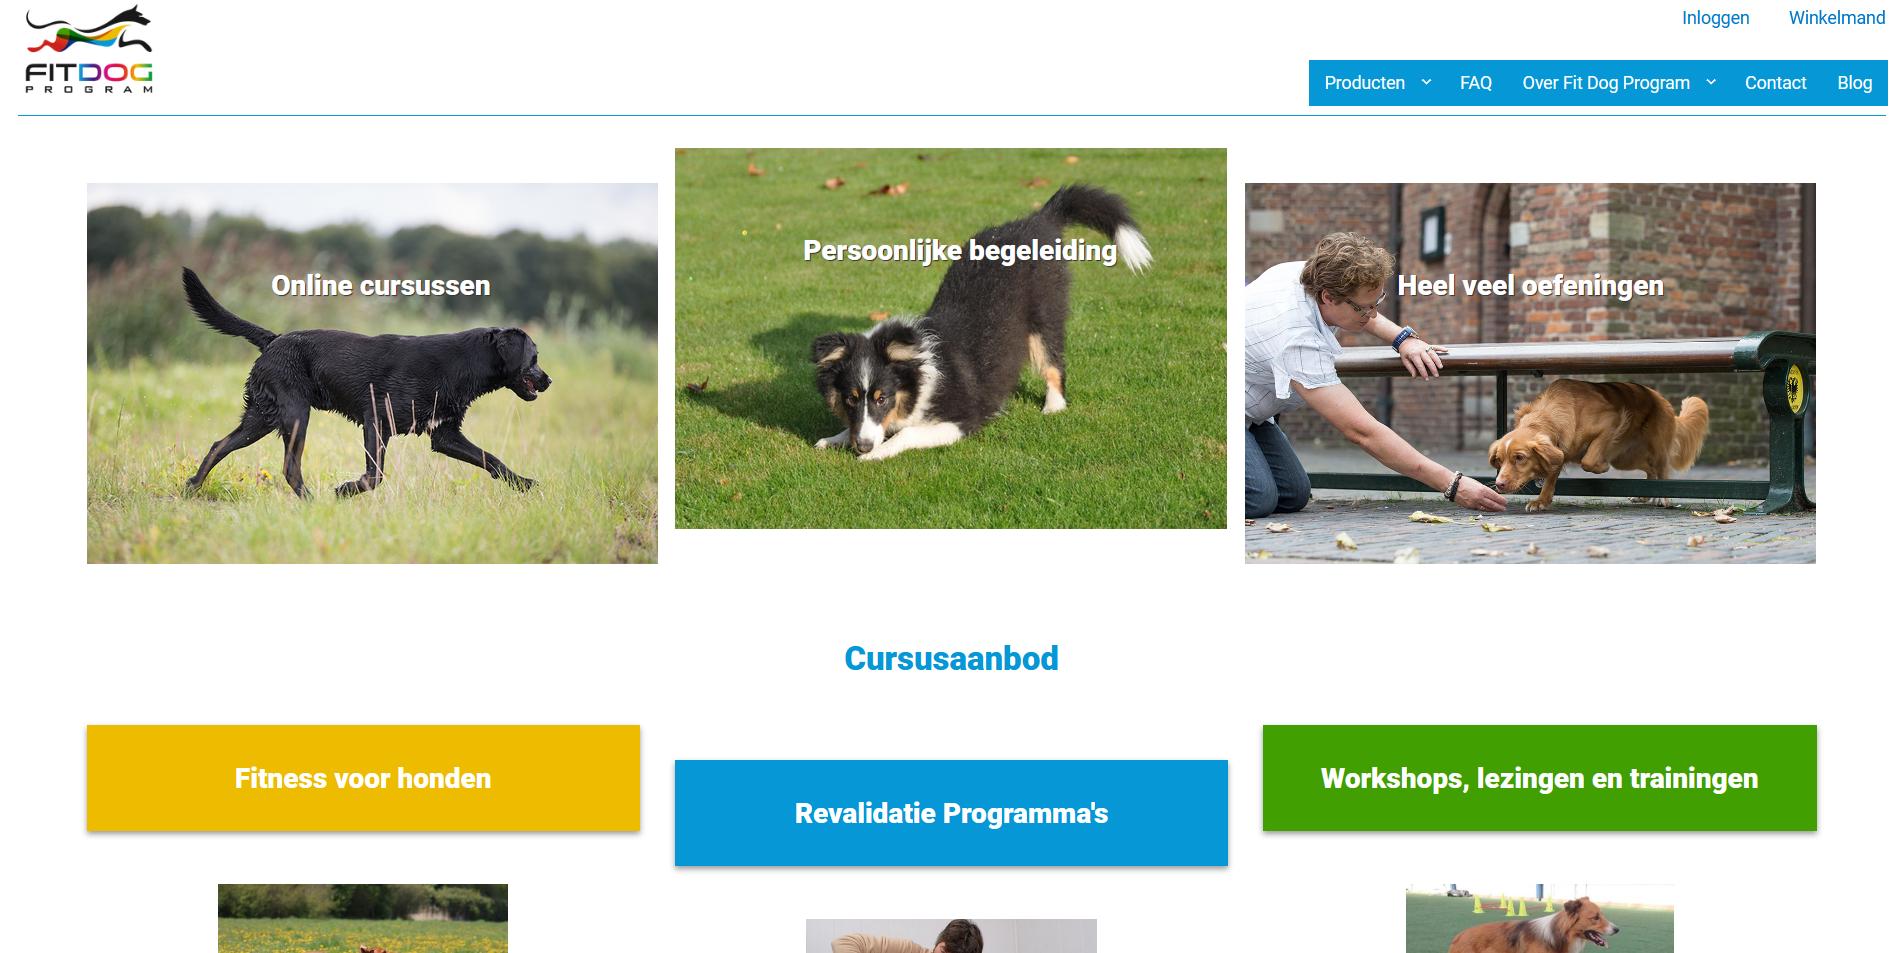 Fit Dog Program